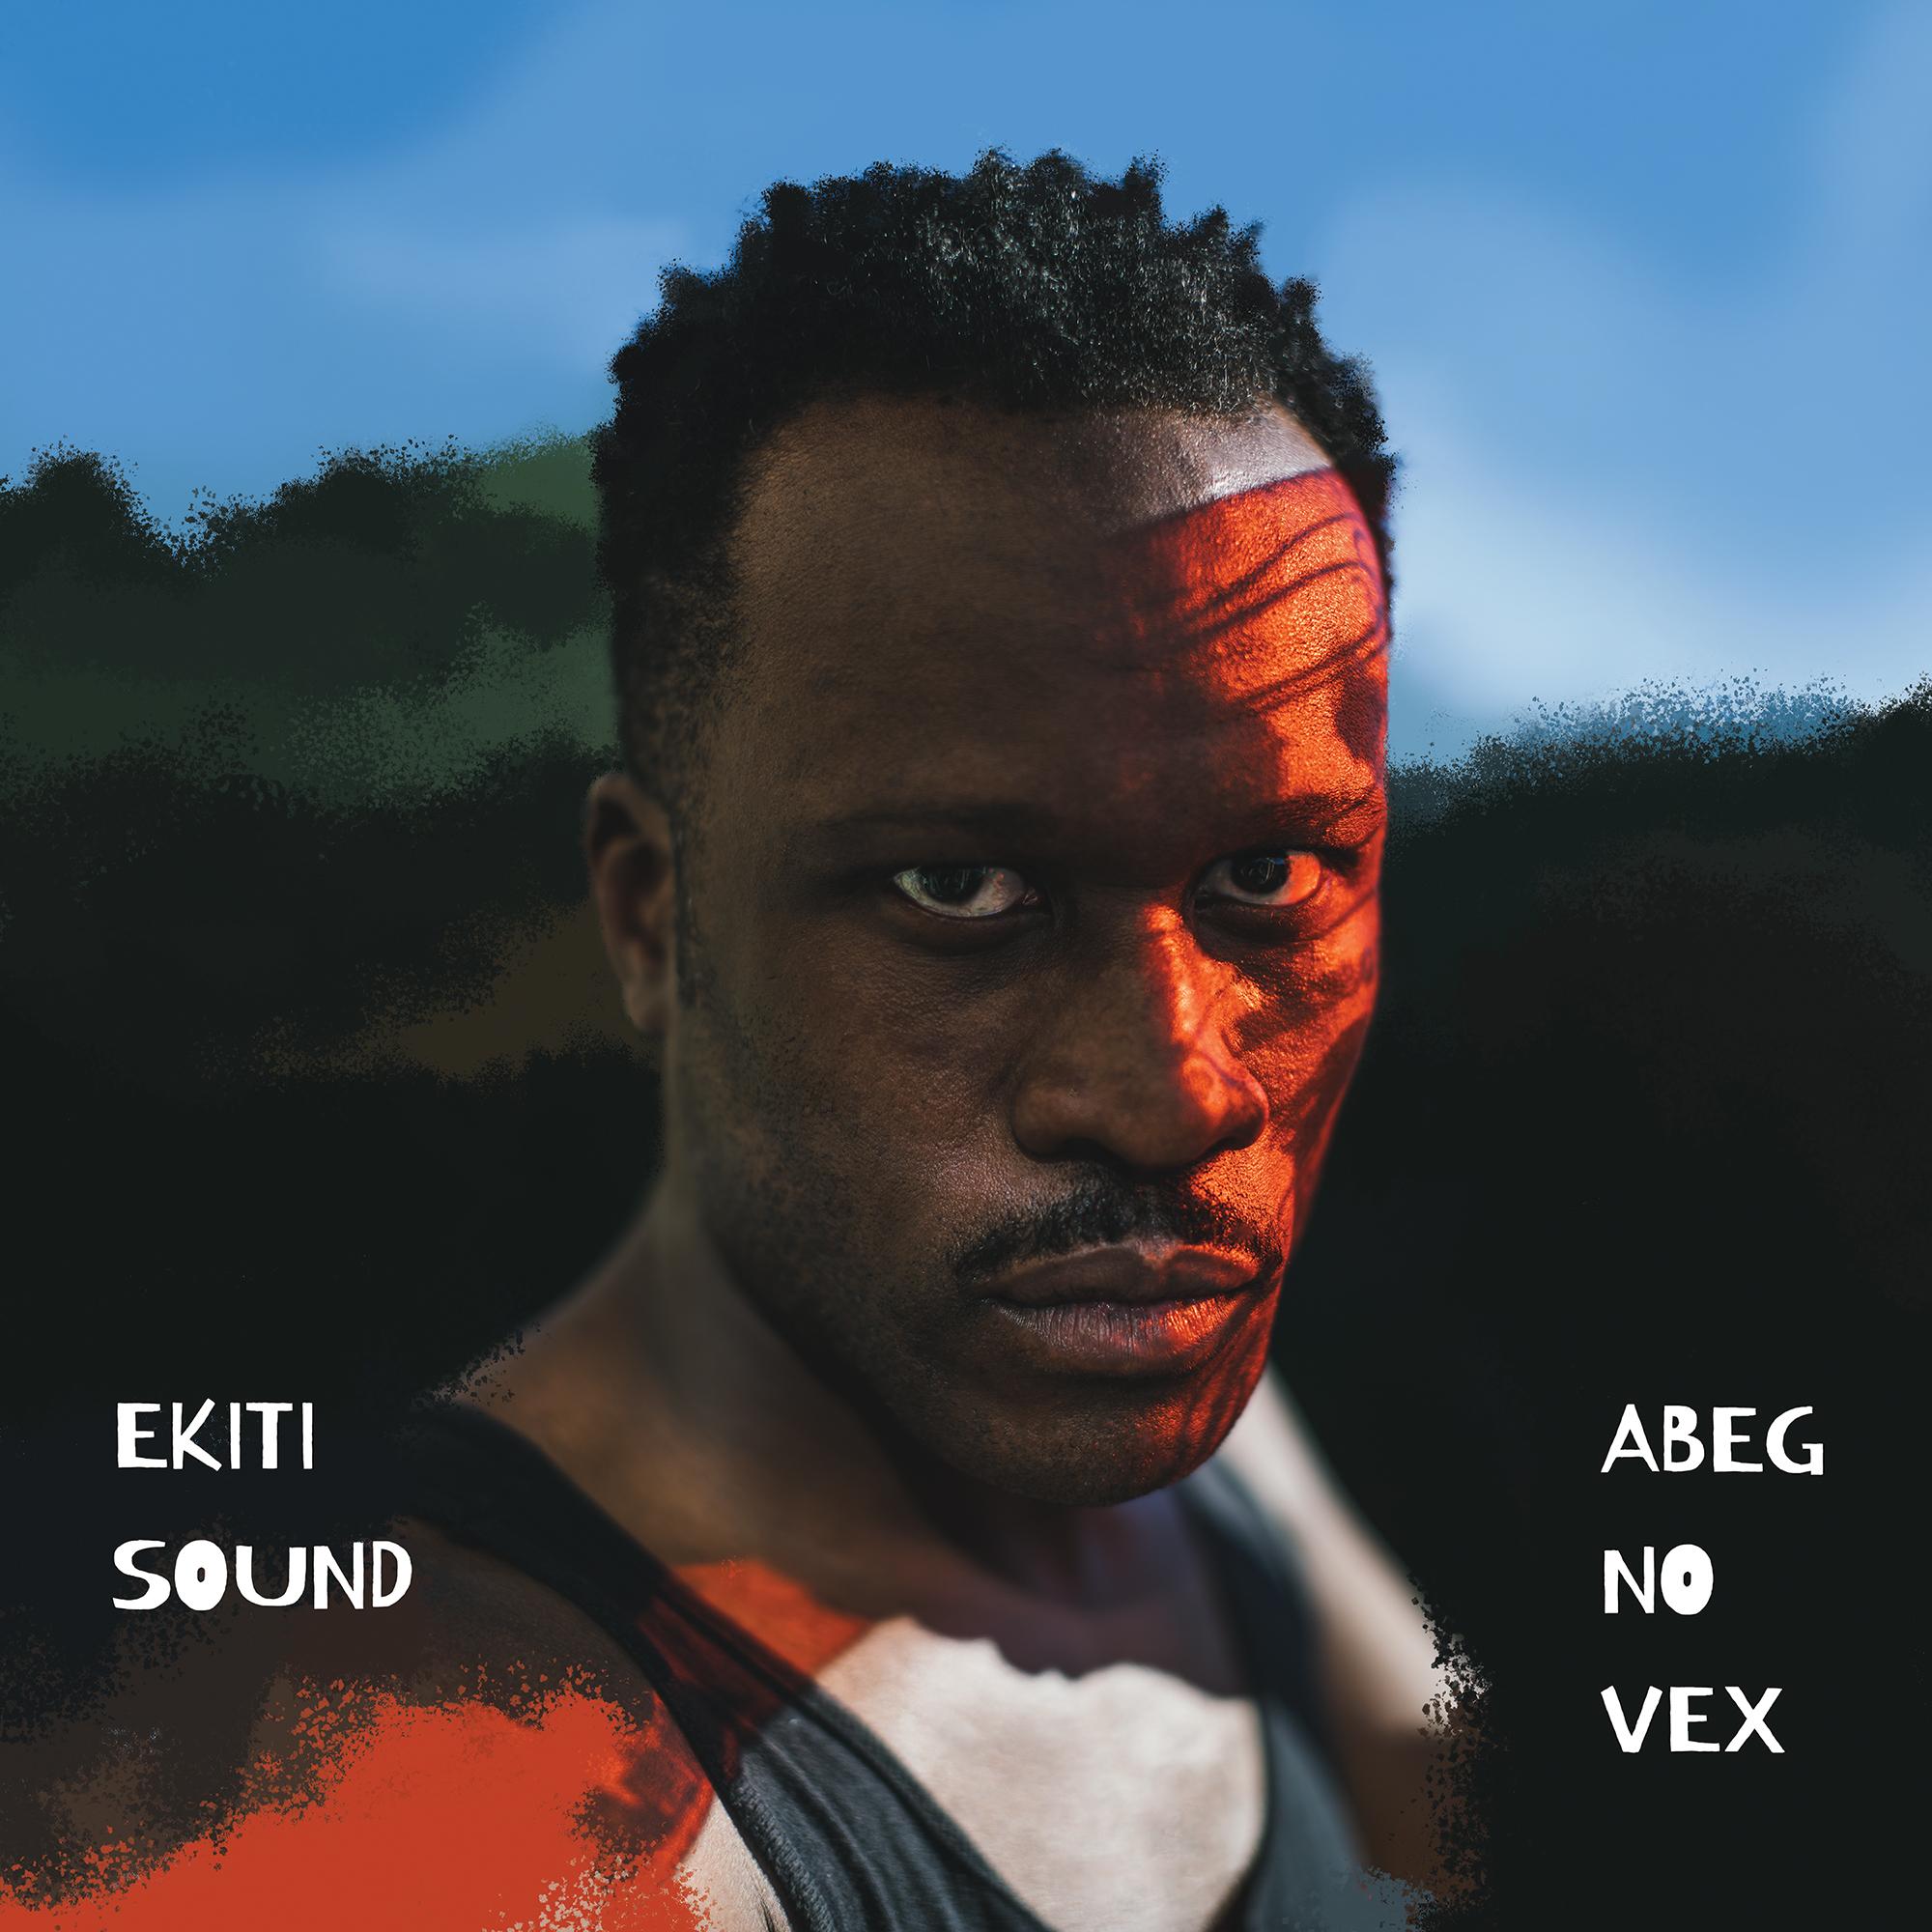 Ekiti Sound